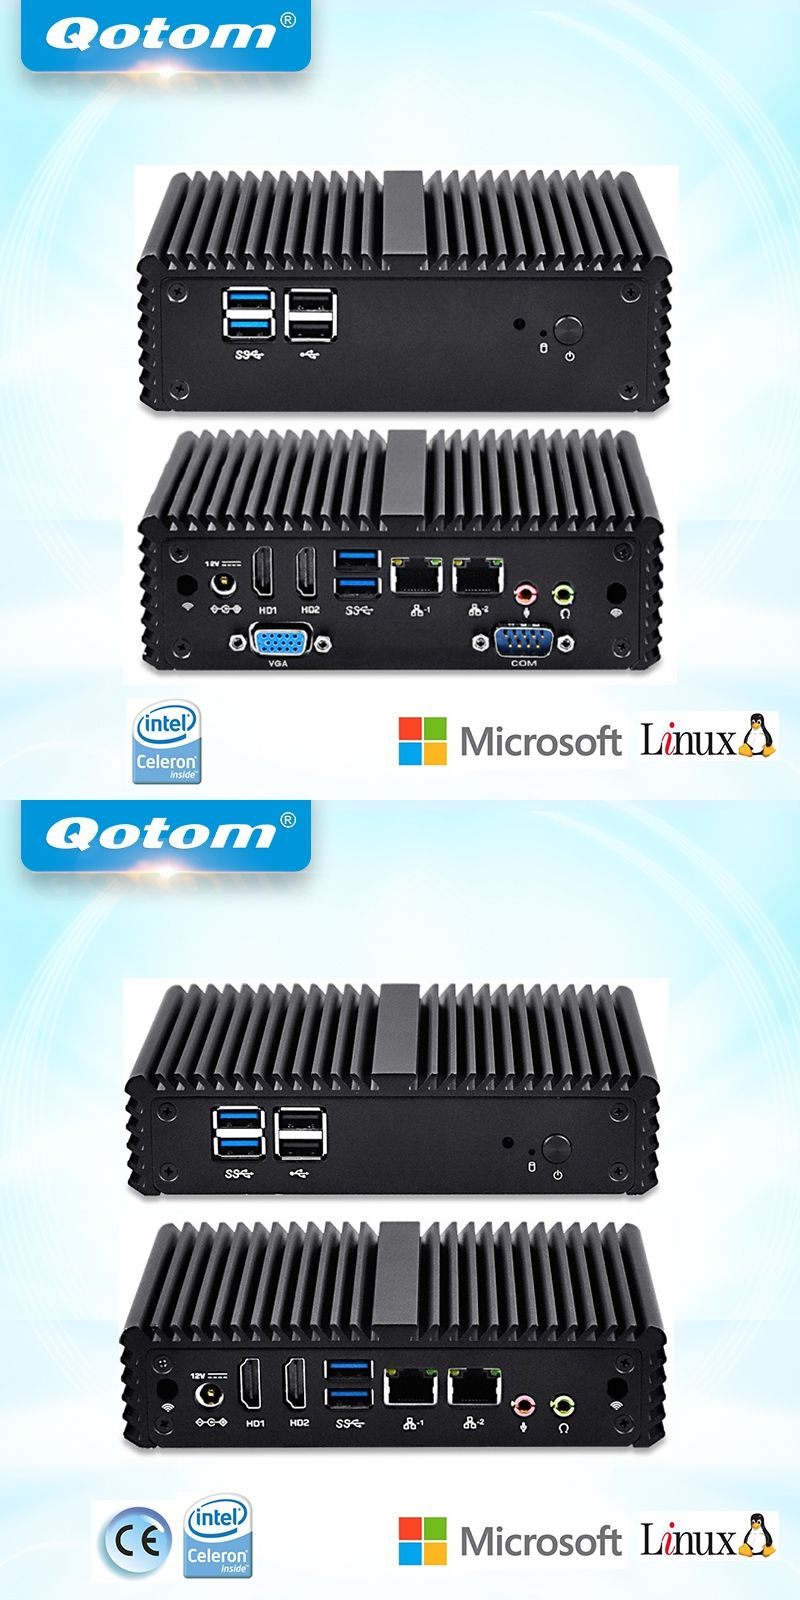 QOTOM Quad core Mini PC with Celeron N3150 processor onboard, 2 LAN